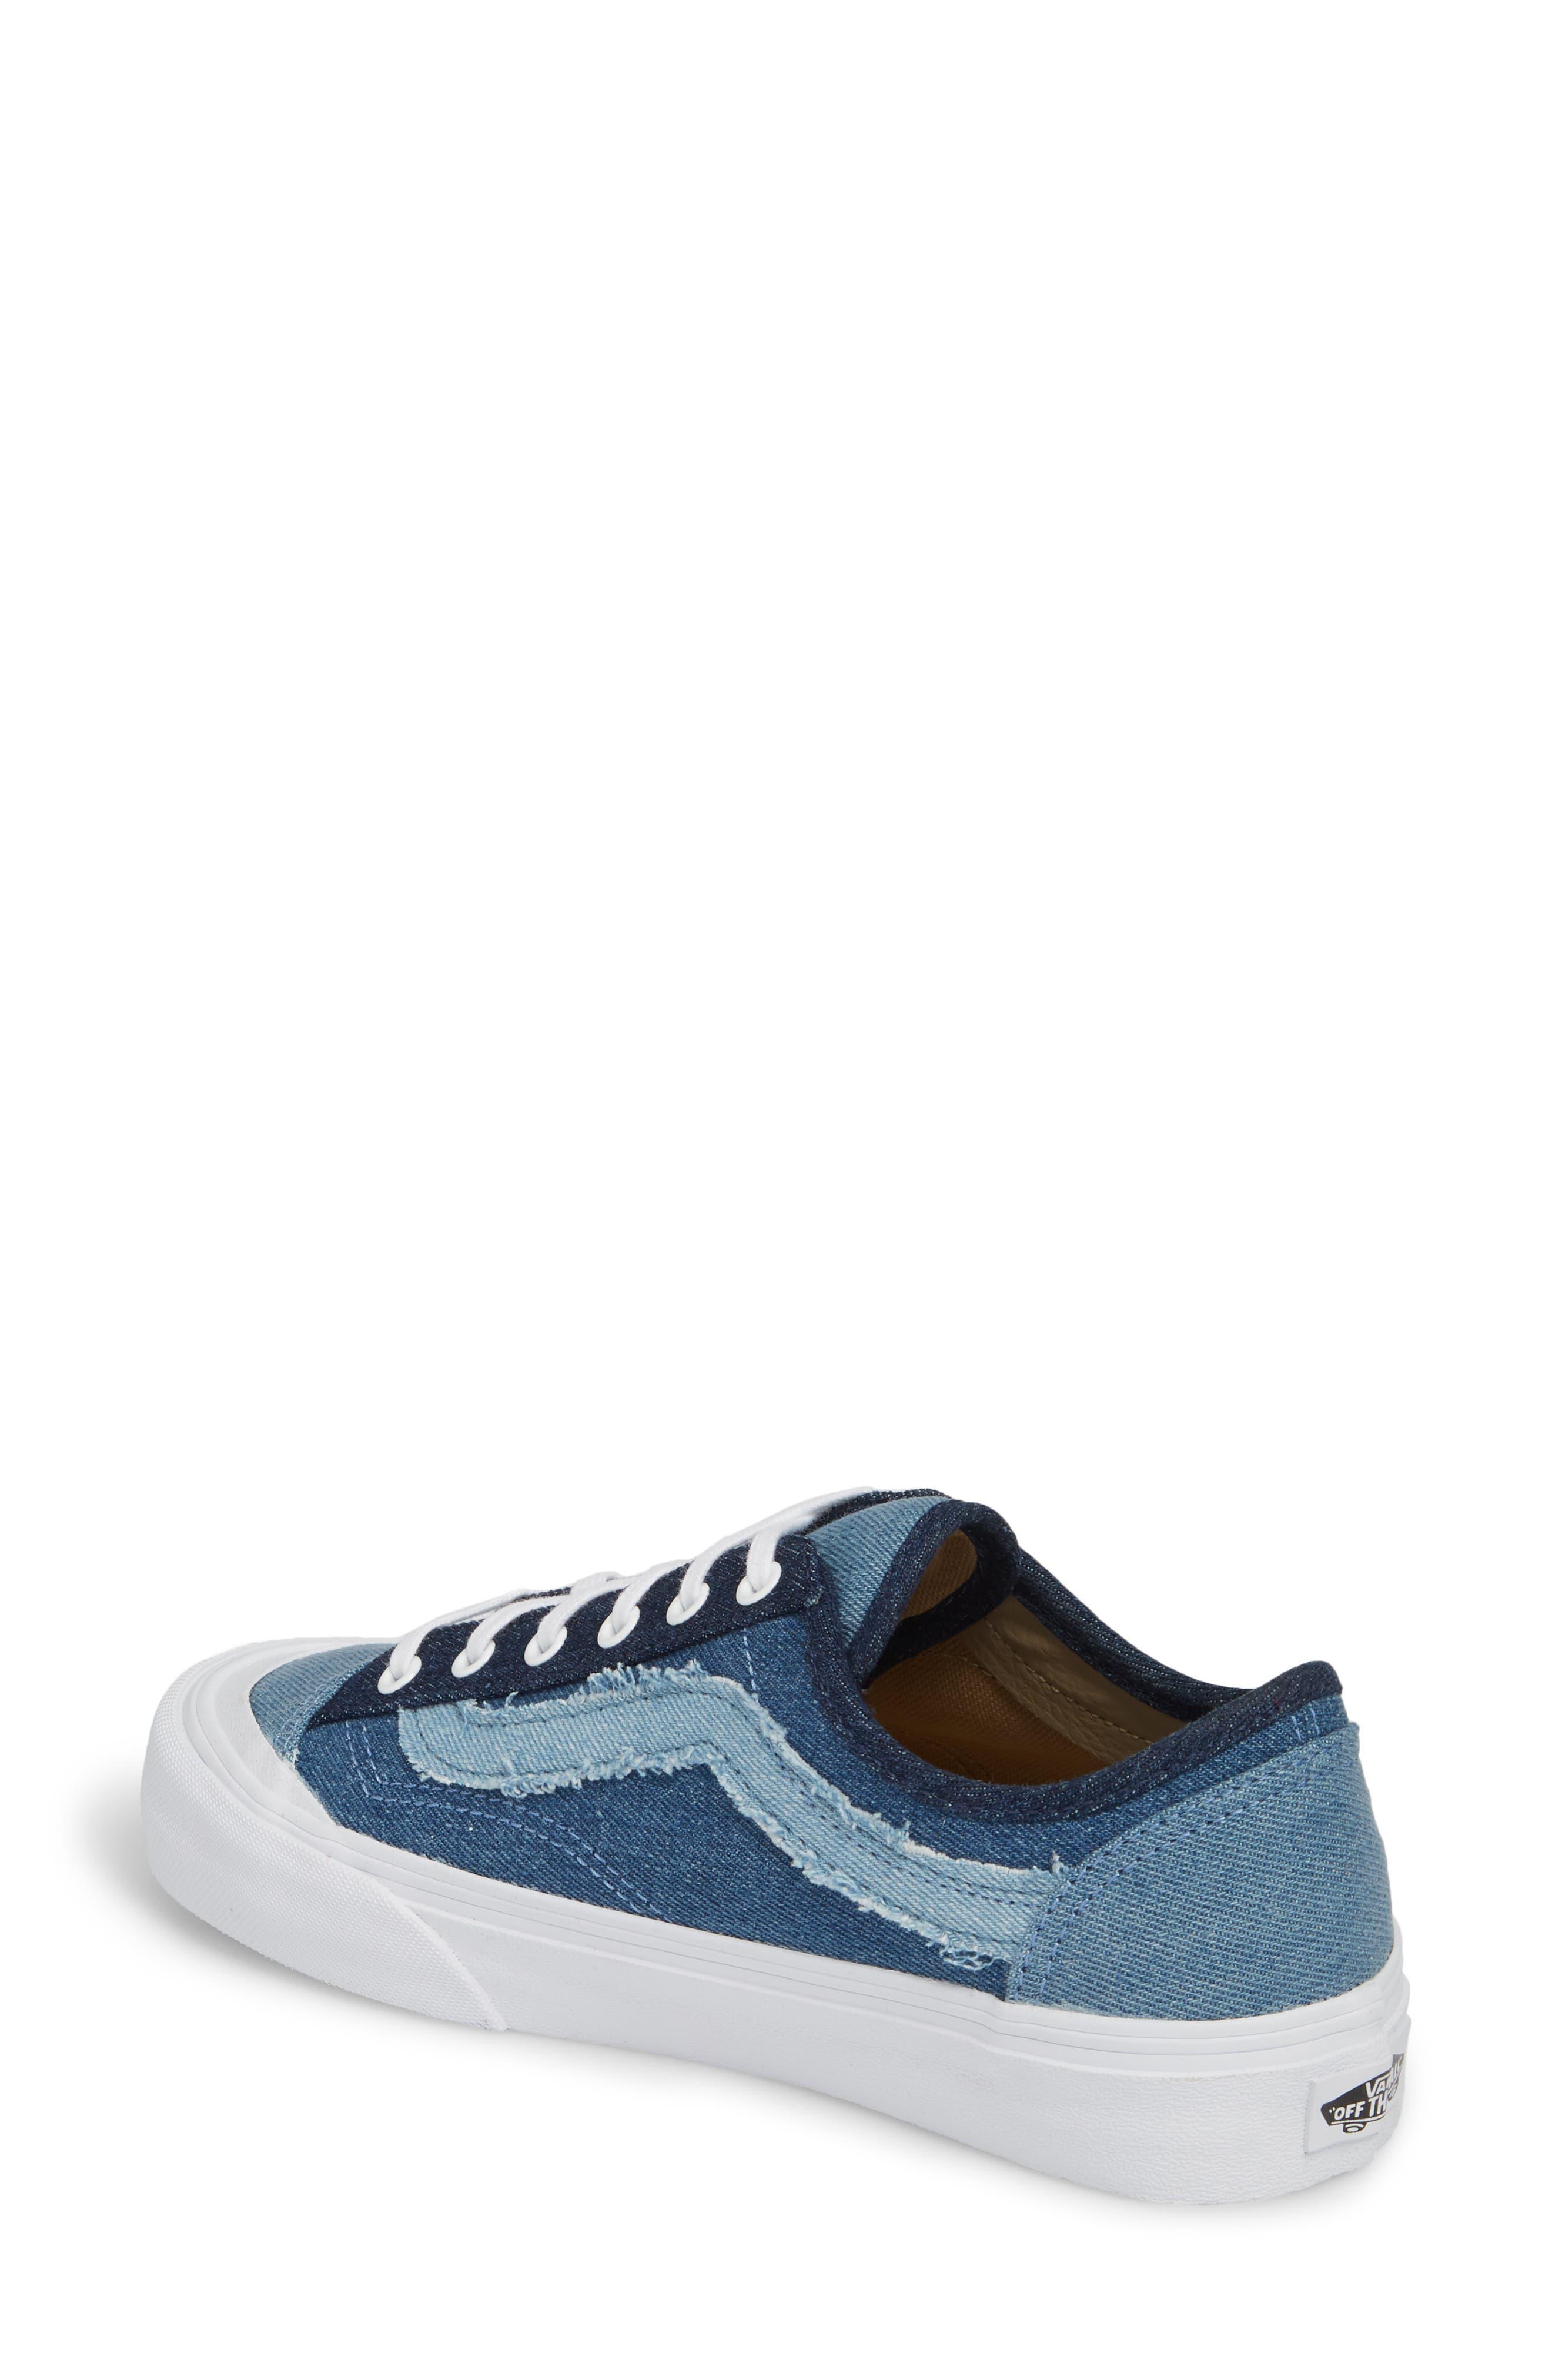 Style 36 Decon Sneaker,                             Alternate thumbnail 4, color,